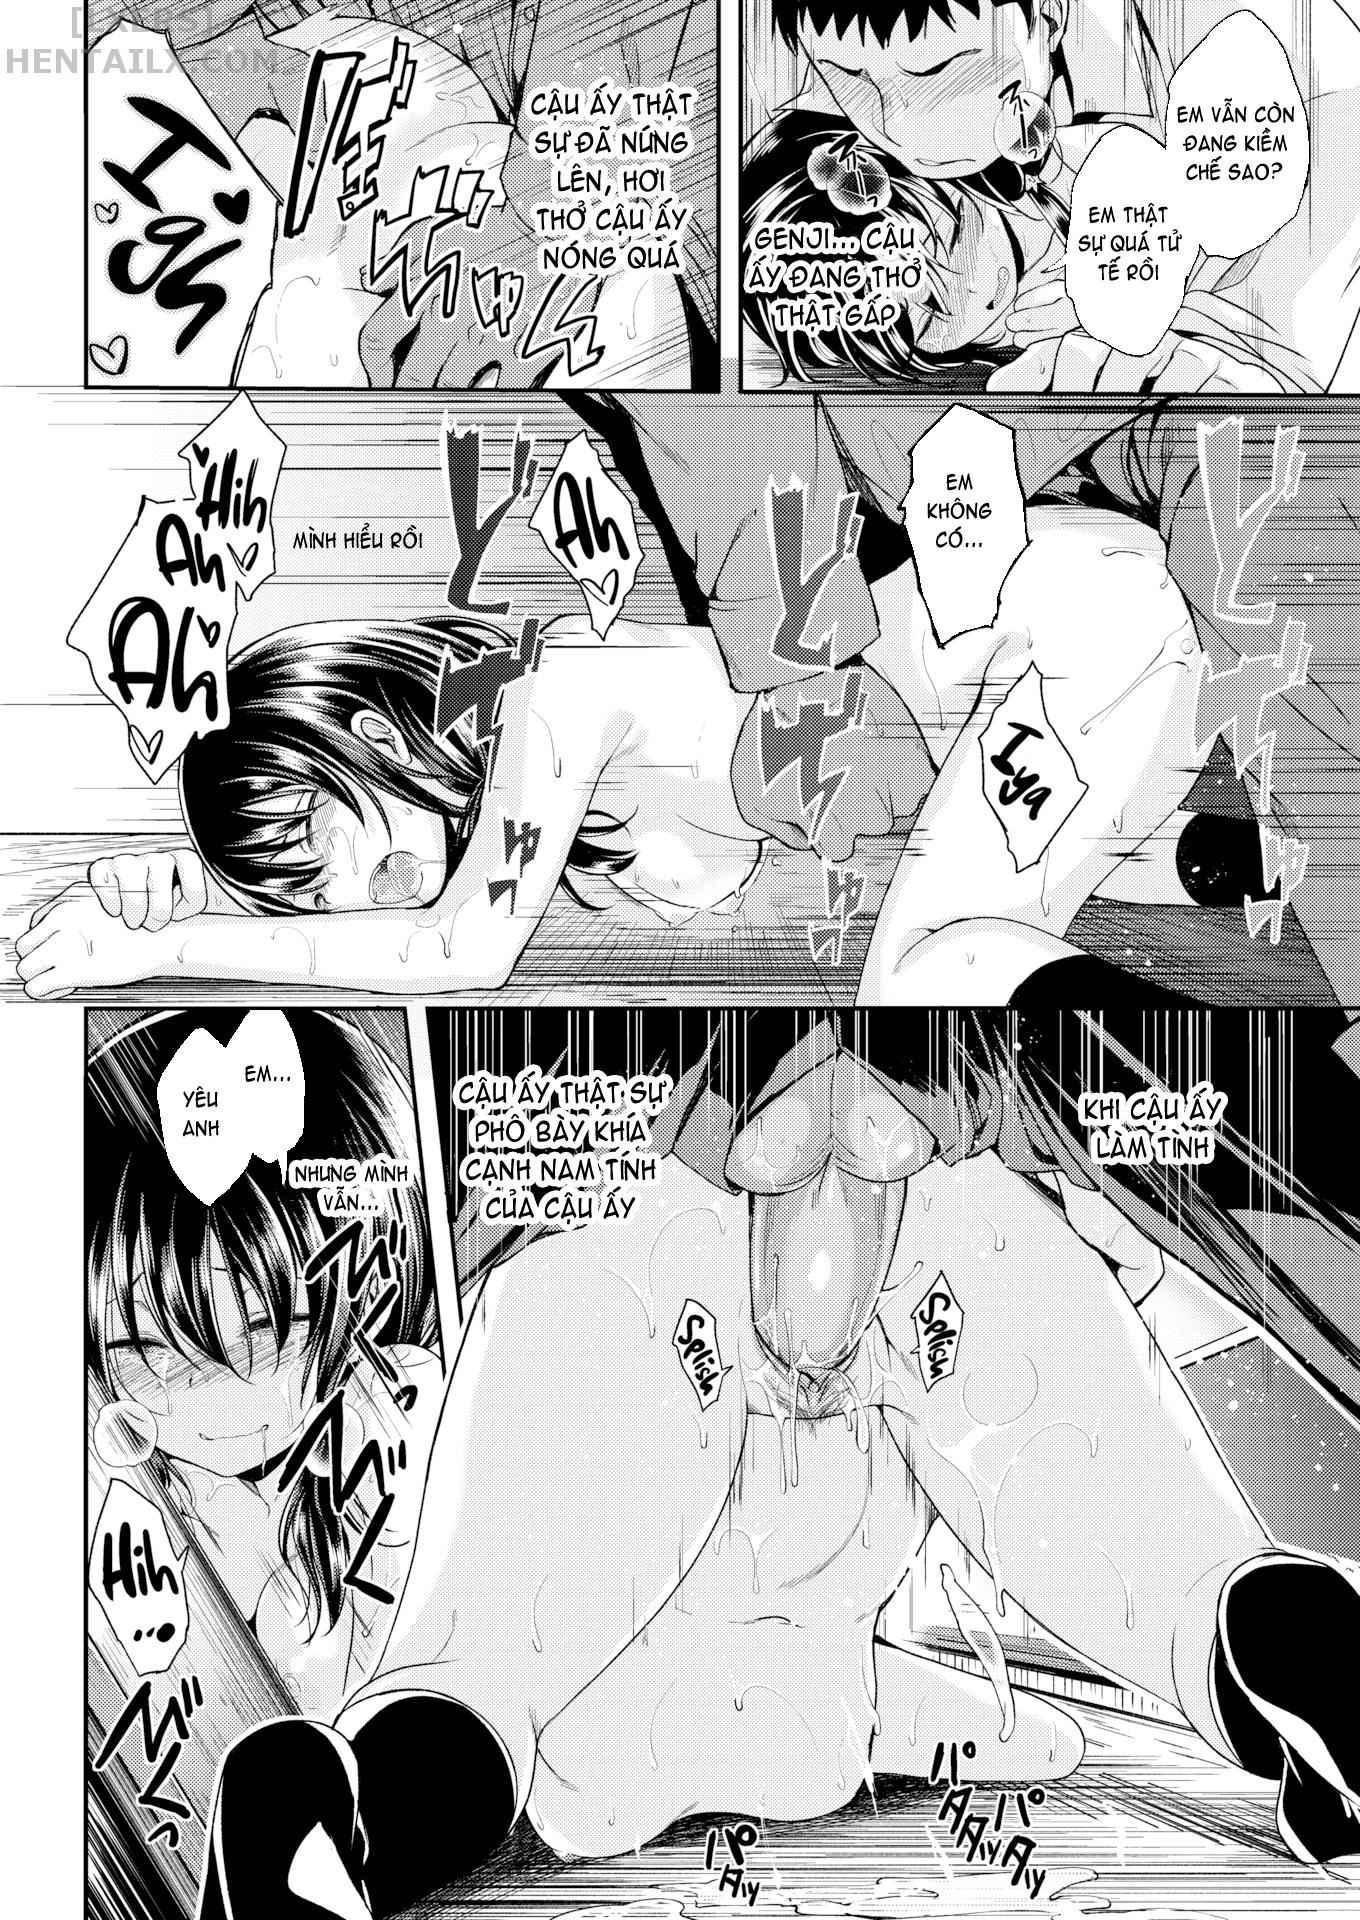 018 First Time  - hentaicube.net - Truyện tranh hentai online